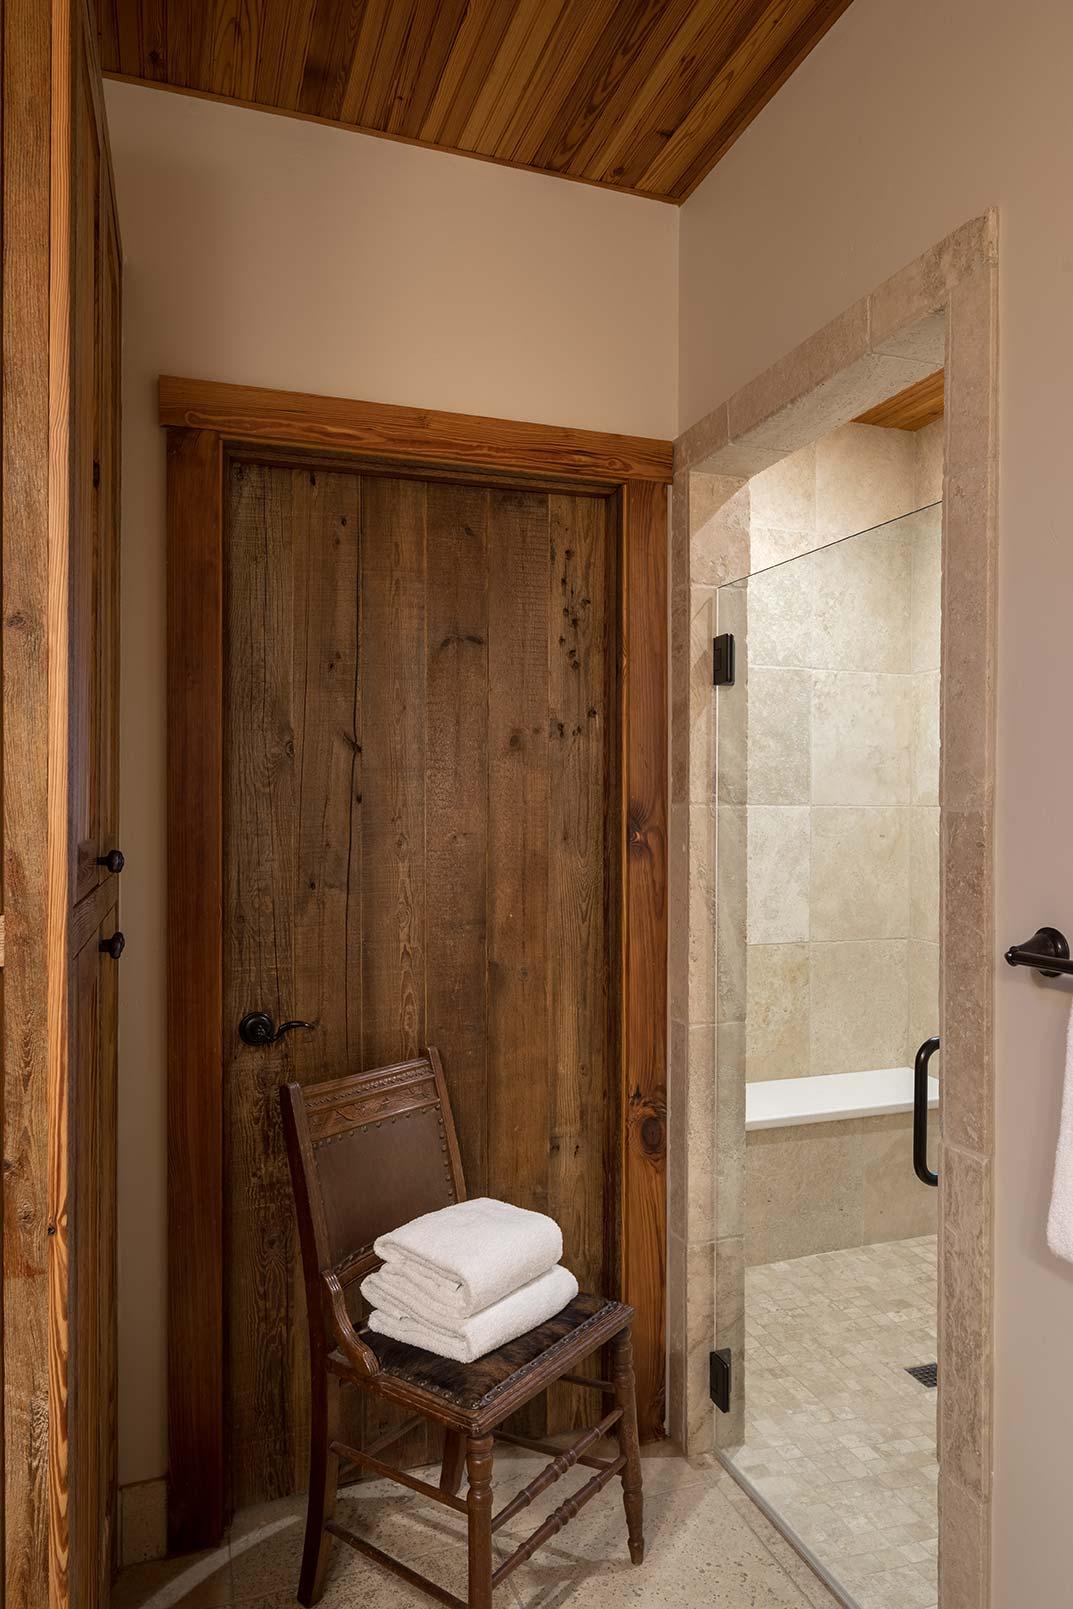 blacksmith-quarters-fredericksburg-realty-texas-commercial-real-estate-for-sale-spa-bathroom-investment.jpg